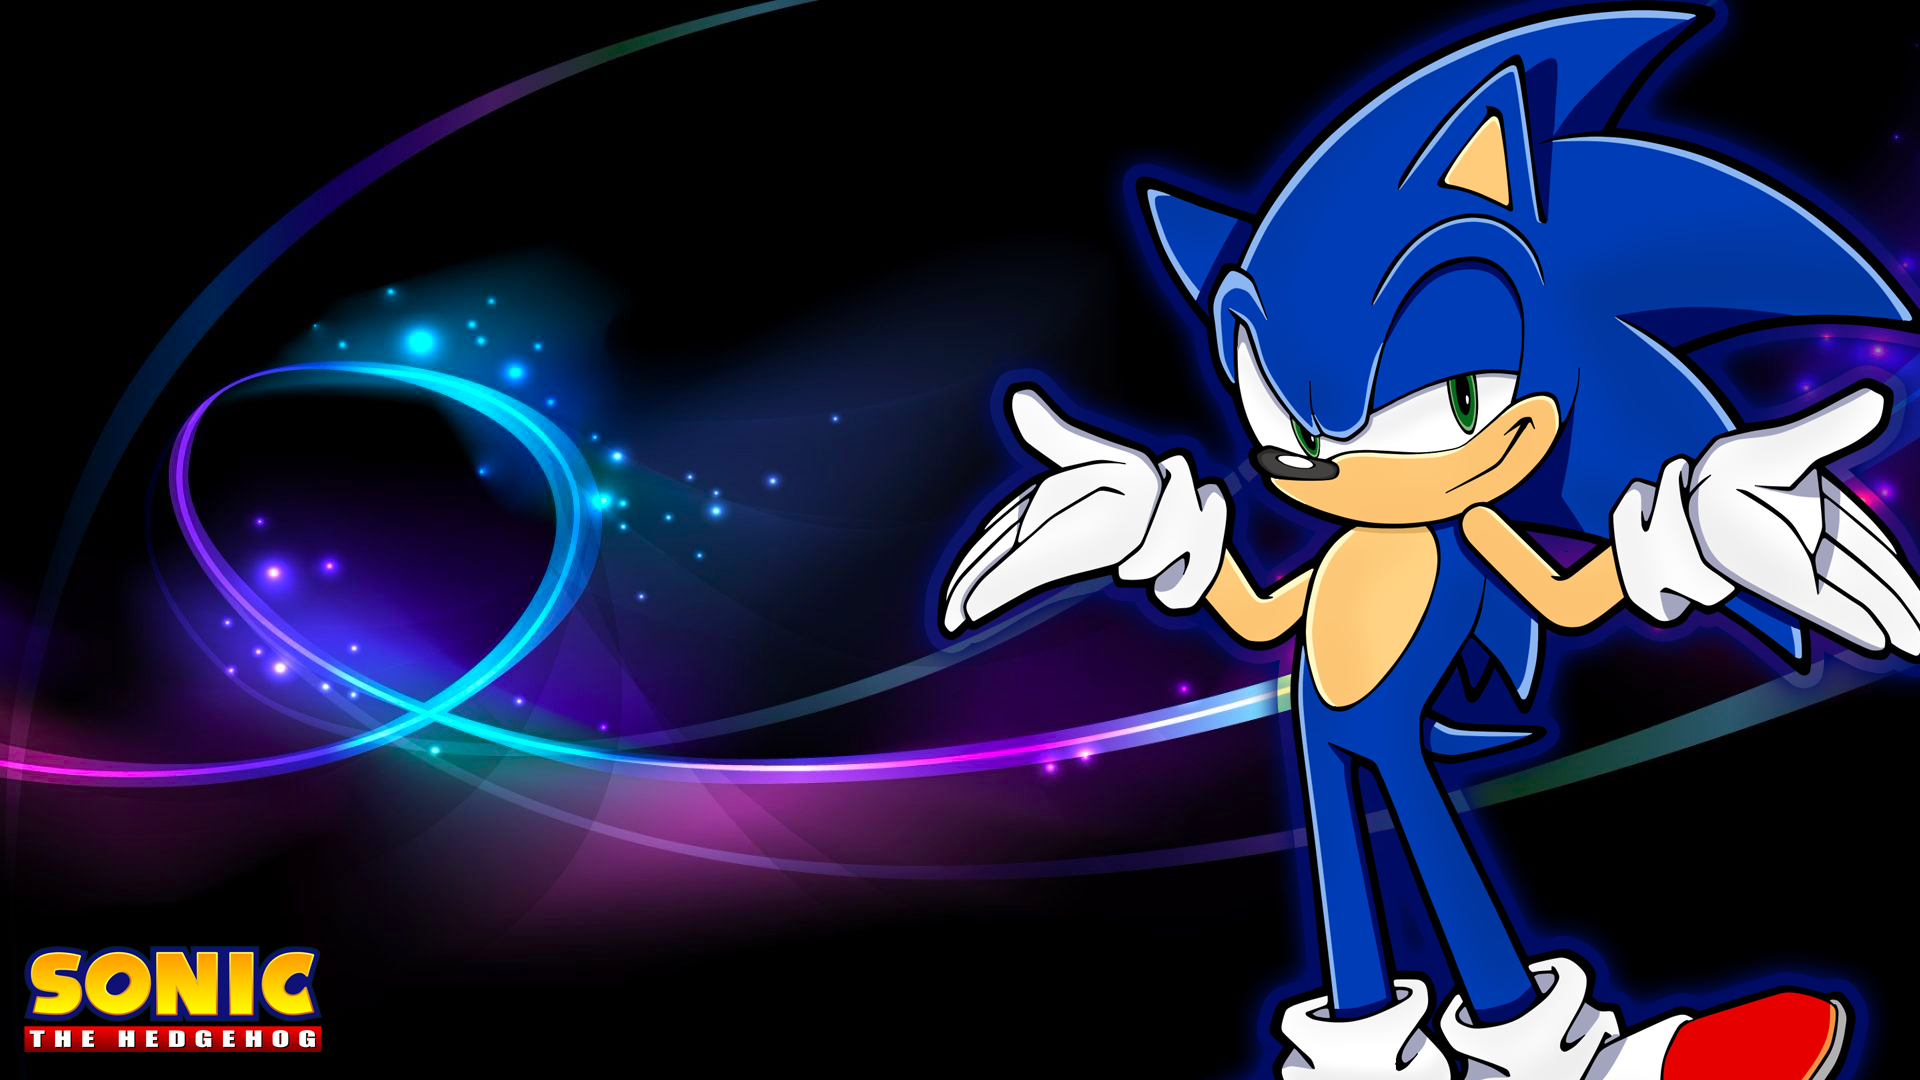 Sonic wallpaper HD download free. Cartoon wallpaper, Hd